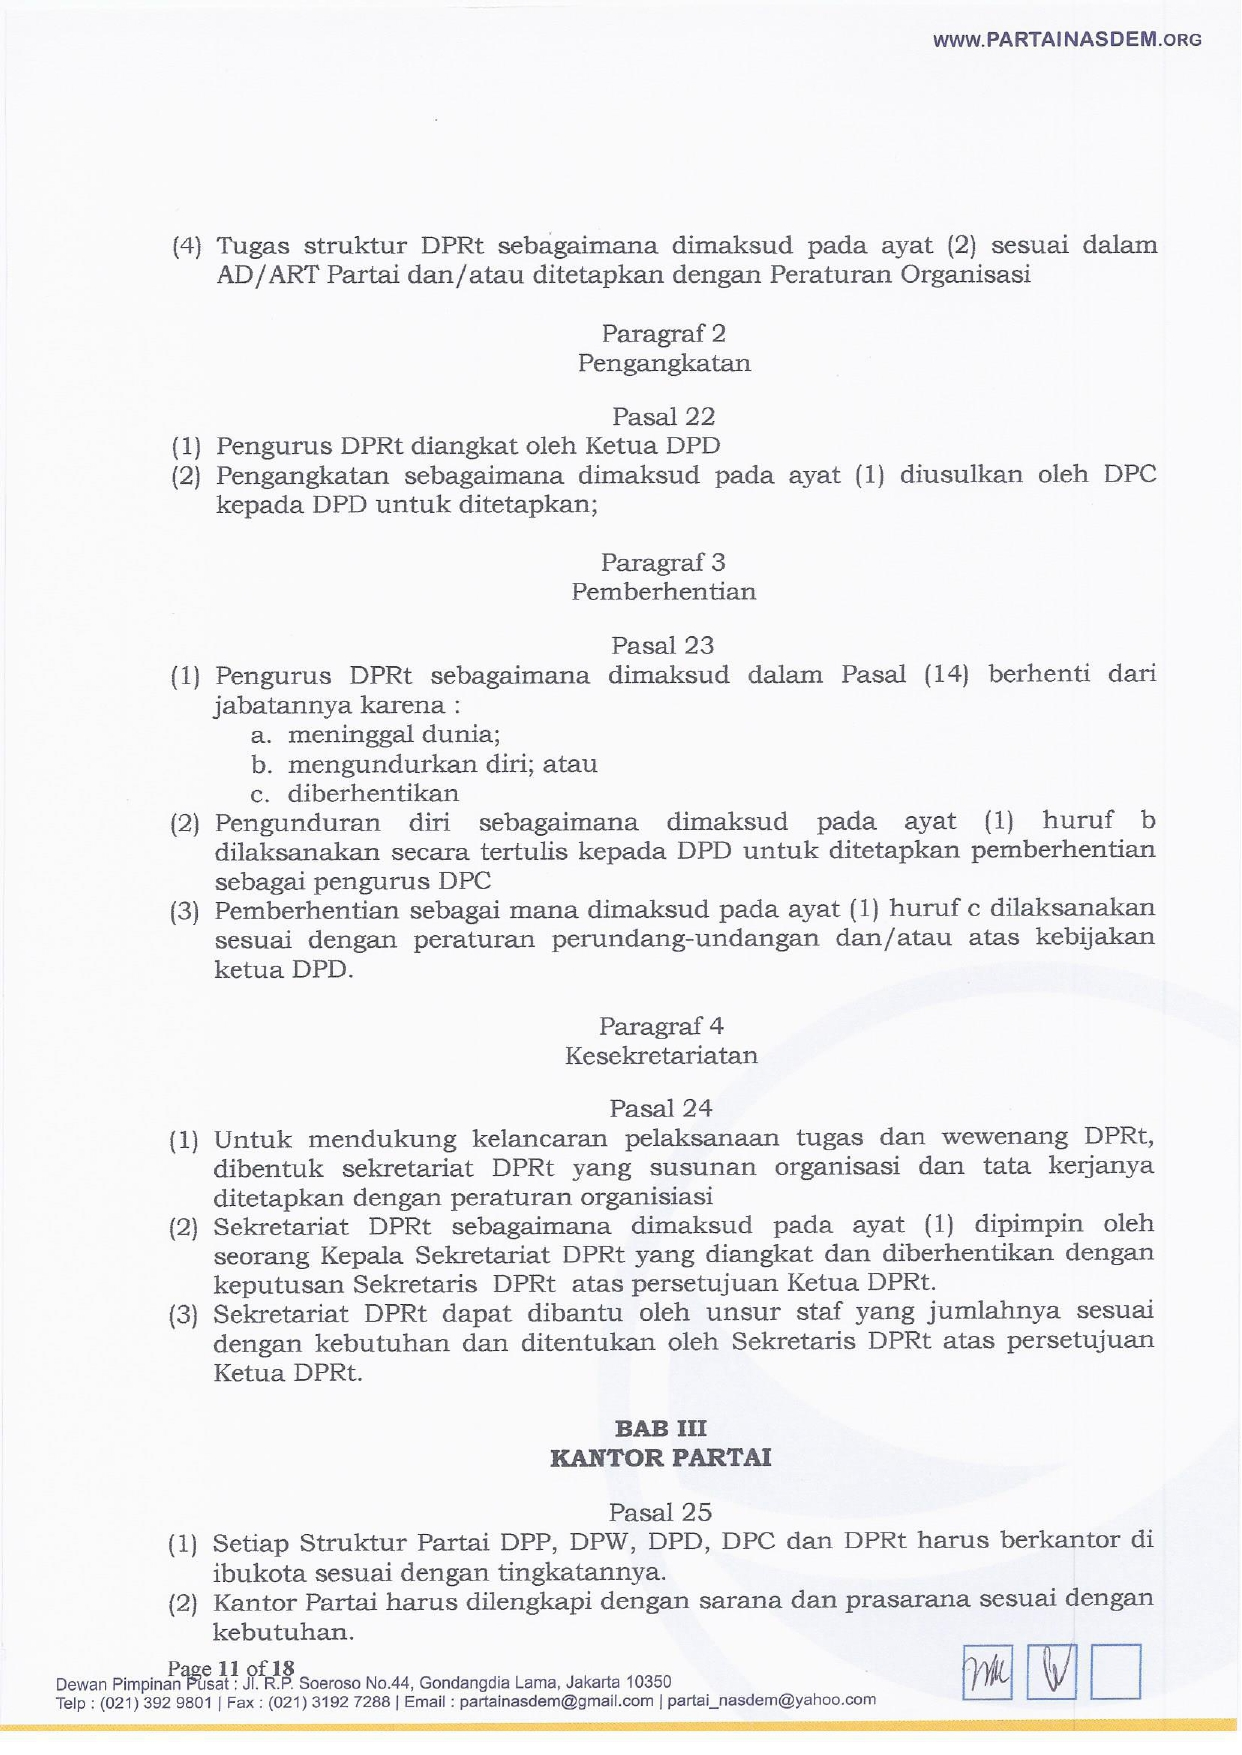 2016_PO no 01 PENGUATAN STRUKTUR DAN PERSIAPAN VERIFIKASI_page-0011